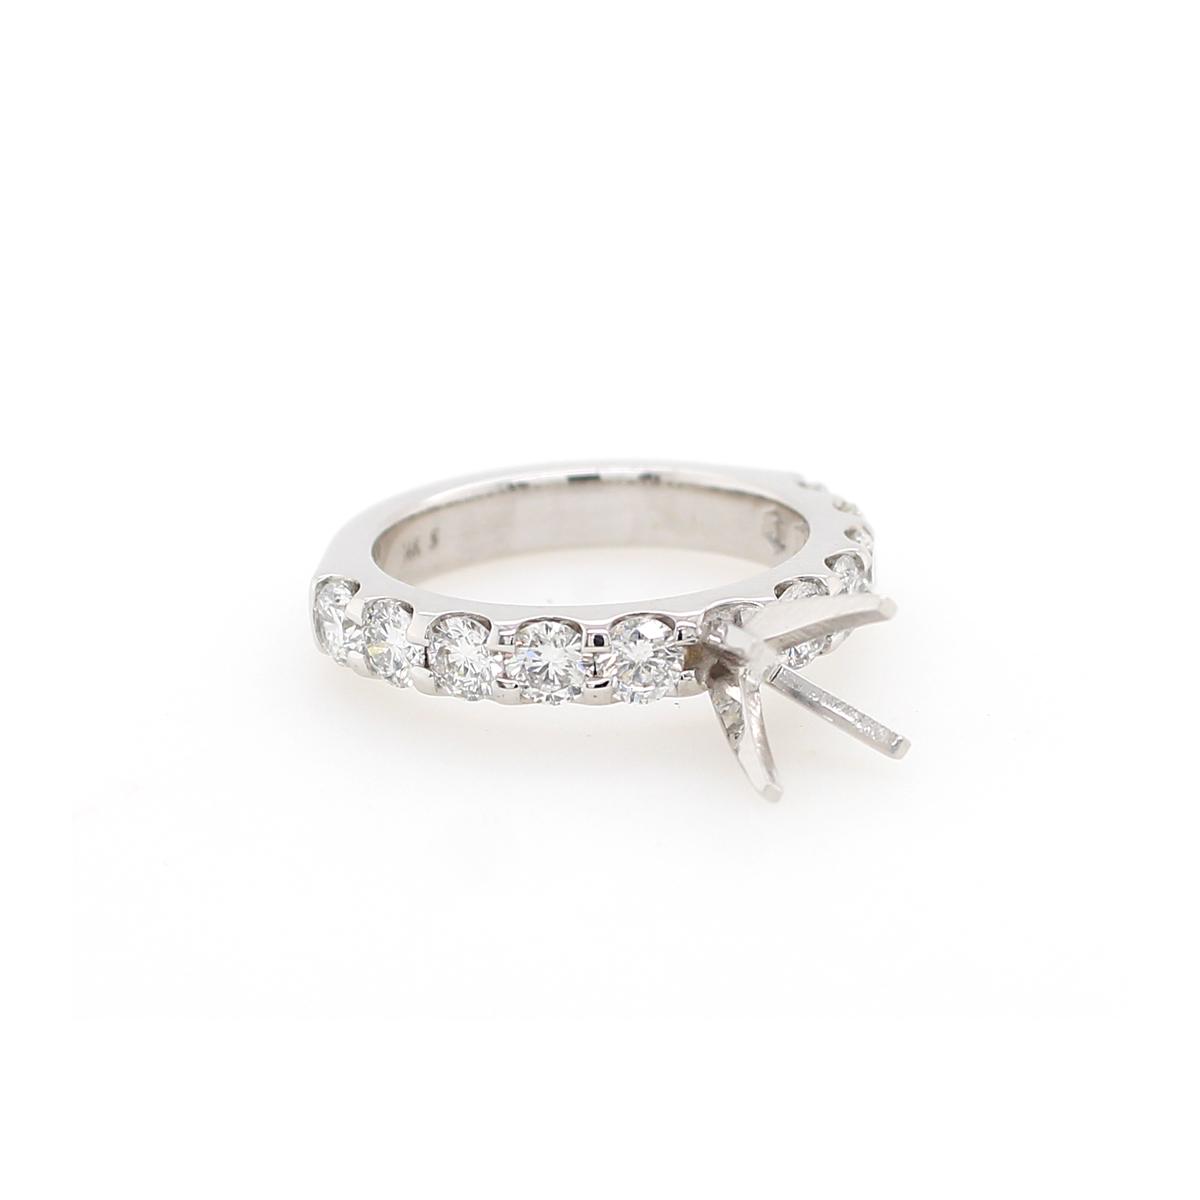 Shefi Diamonds 14 Karat White Gold 2 Carat Diamond Semi-Mount Engagement Ring